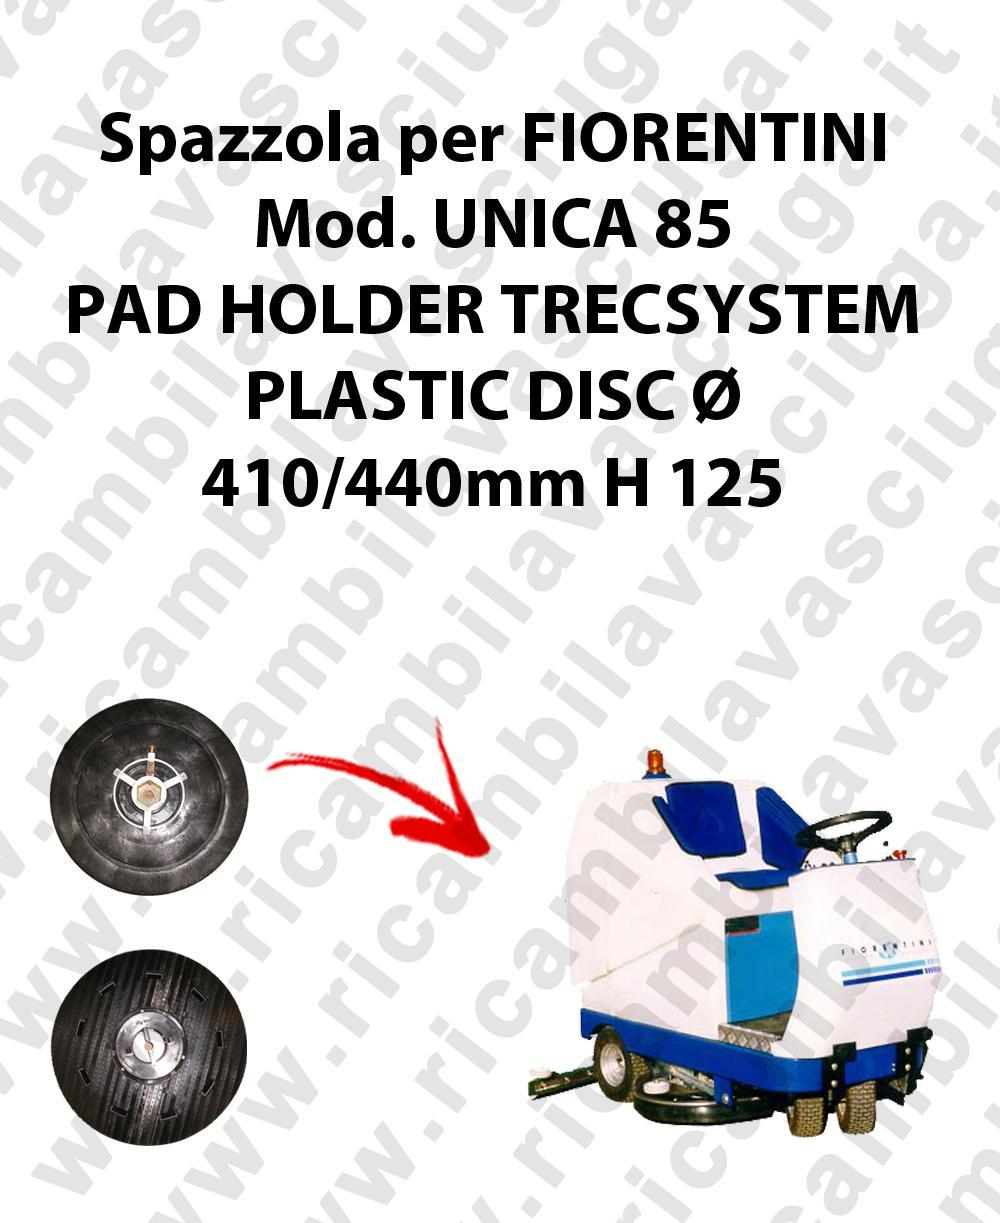 PAD HOLDER TRECSYSTEM  for scrubber dryer FIORENTINI Model UNICA 85